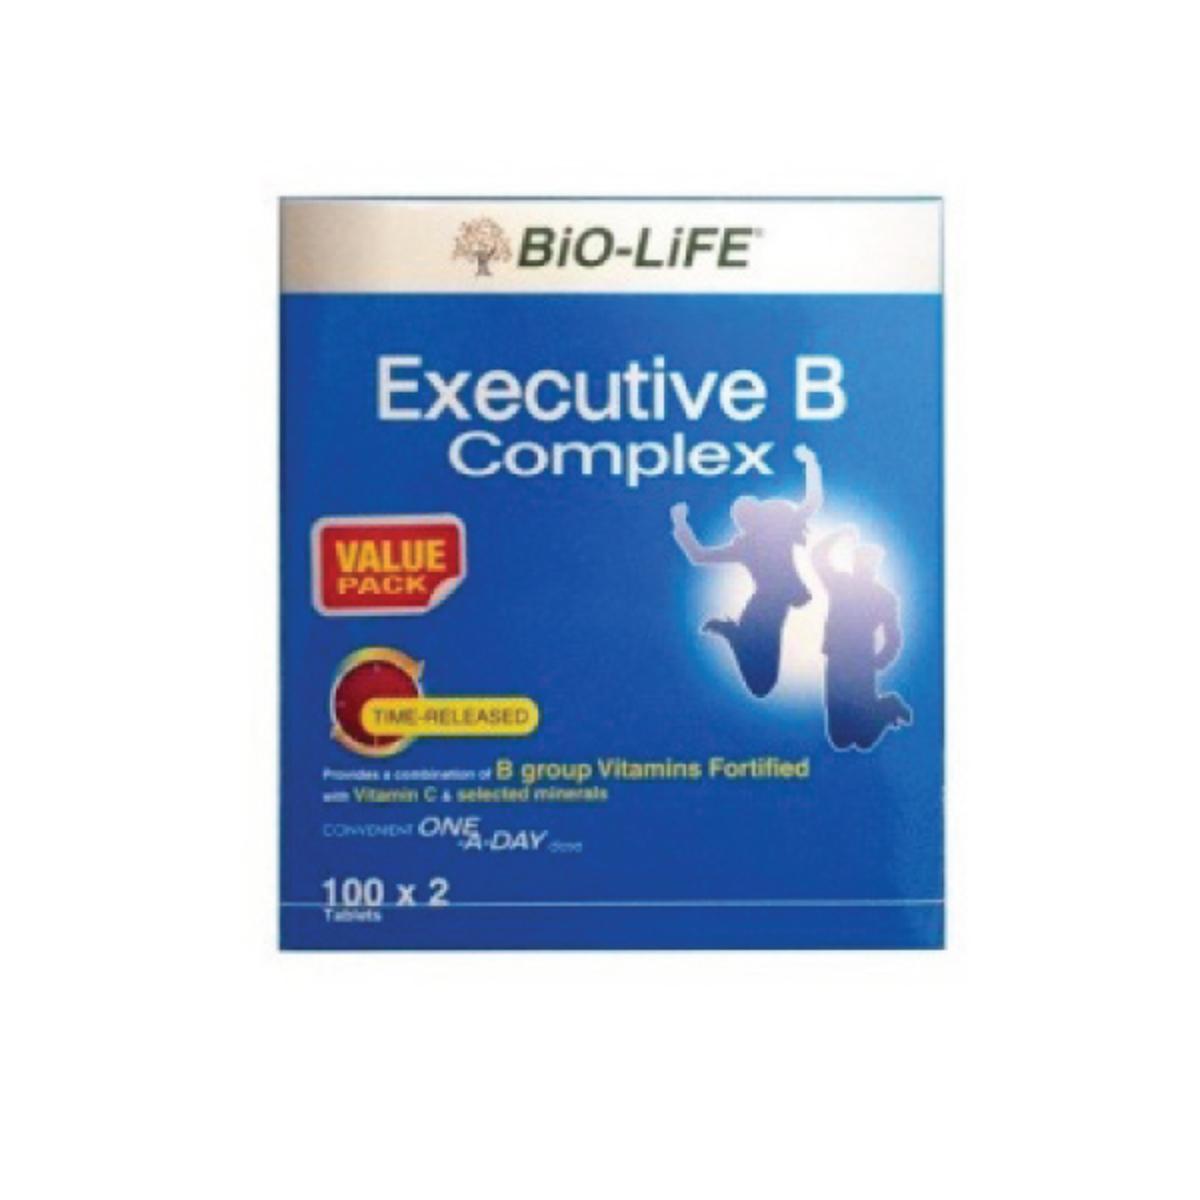 bio-life executive b complex 100sx2 (12083) | go shop